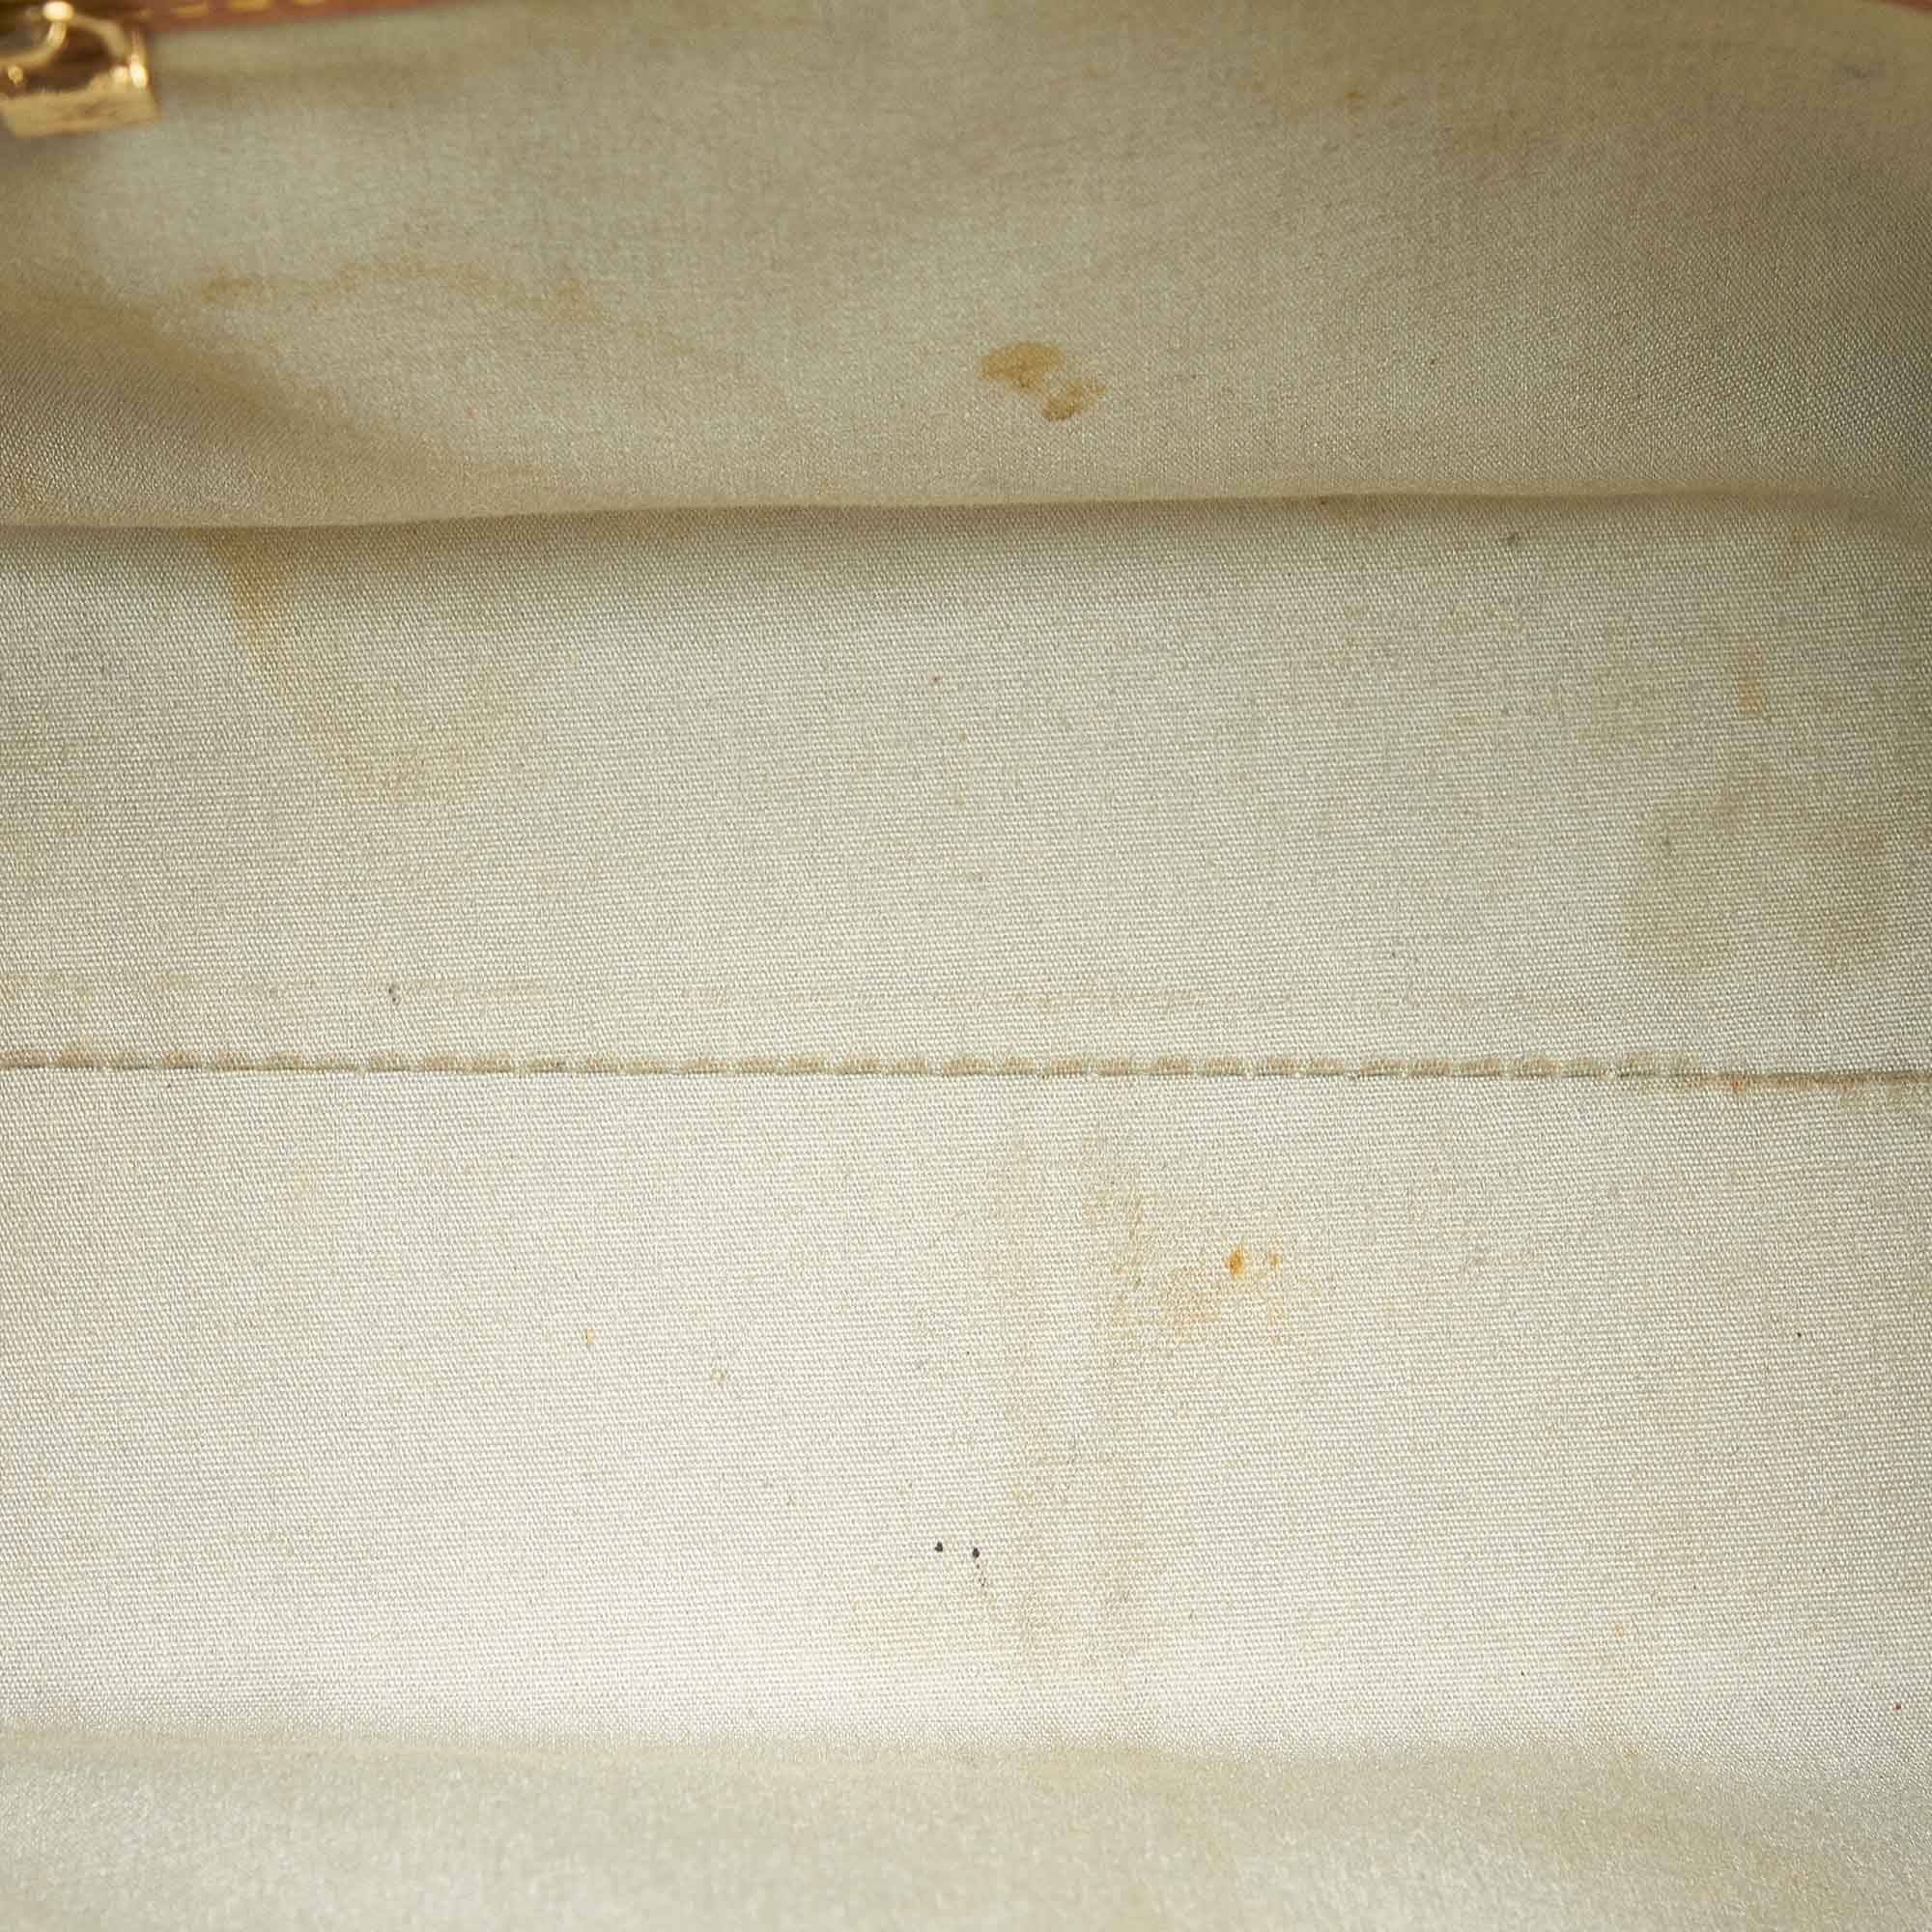 Vintage Louis Vuitton Vernis Reade PM White